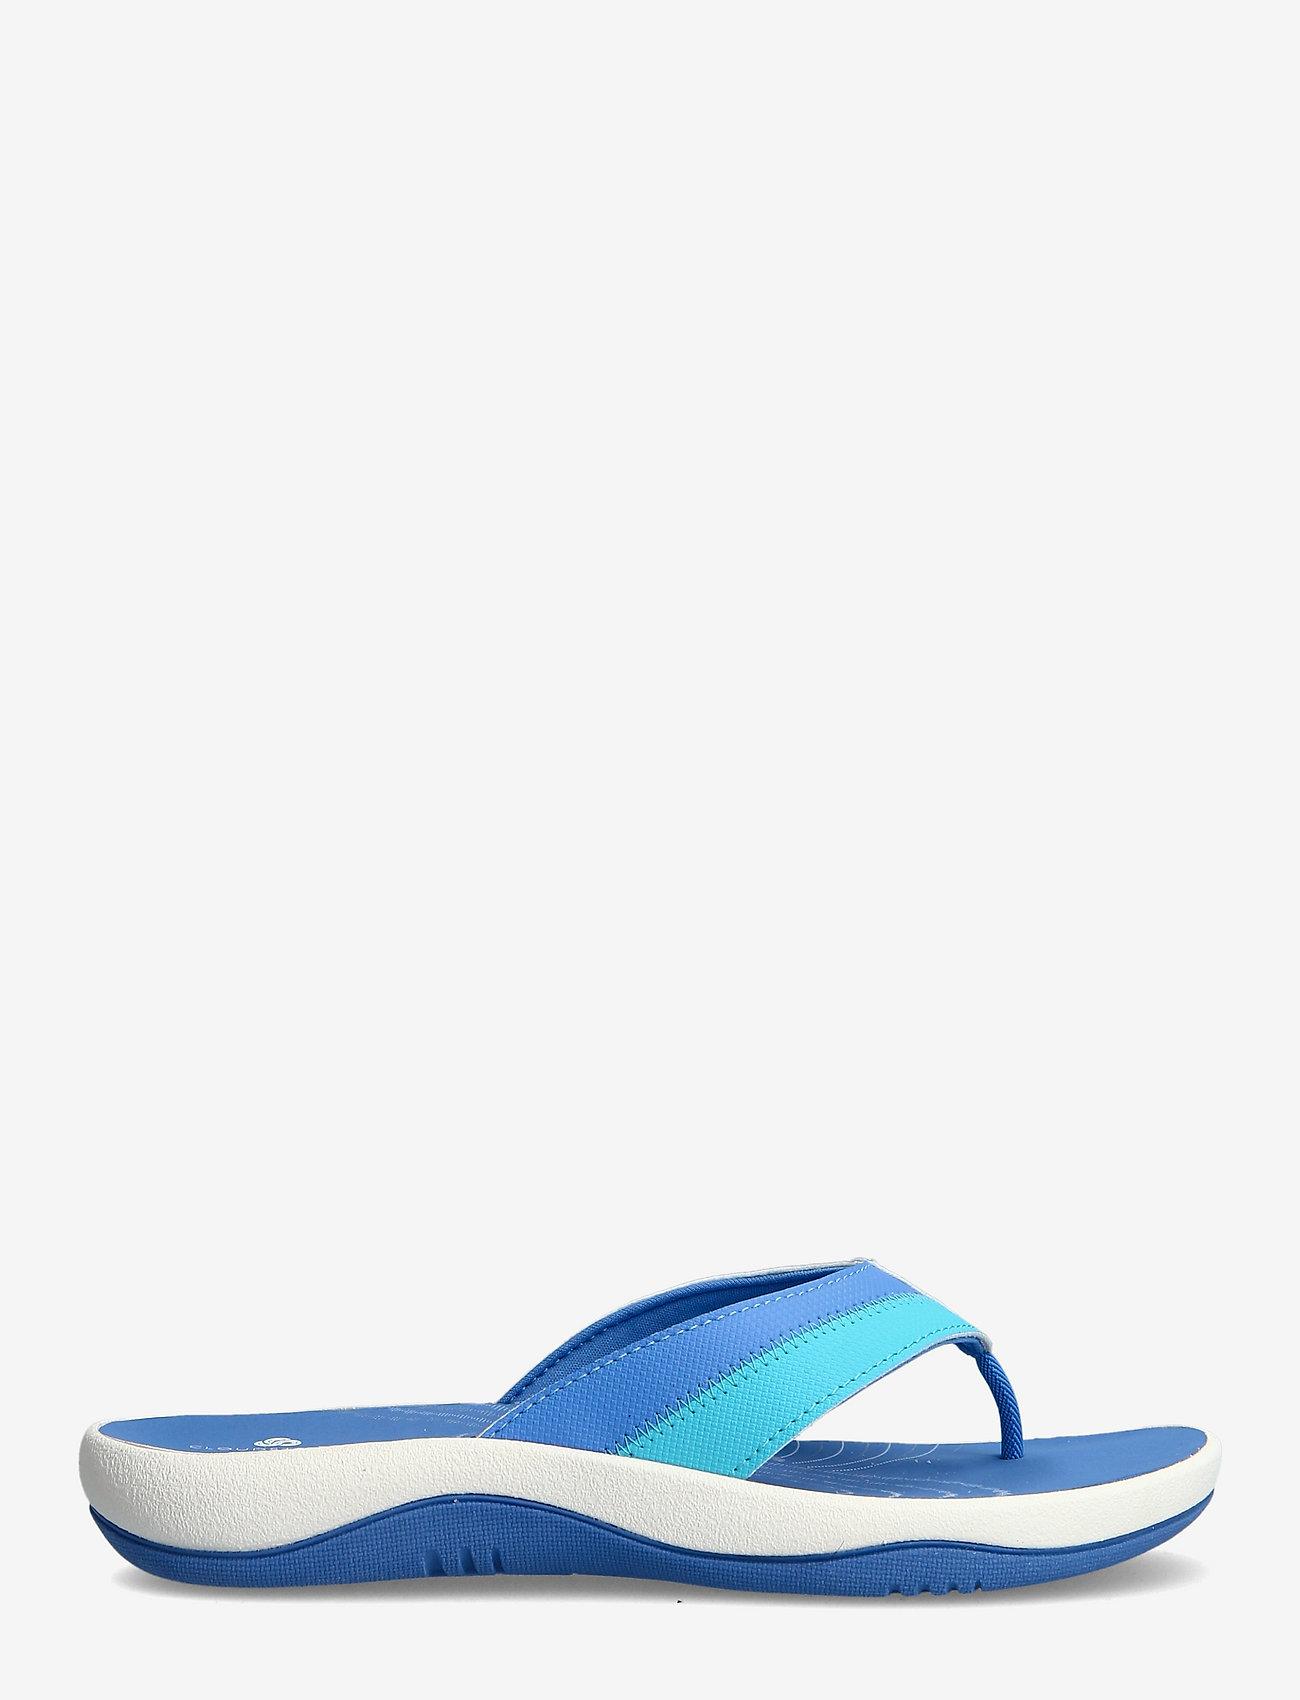 Clarks - Sunni Surf - platta sandaler - blue - 1